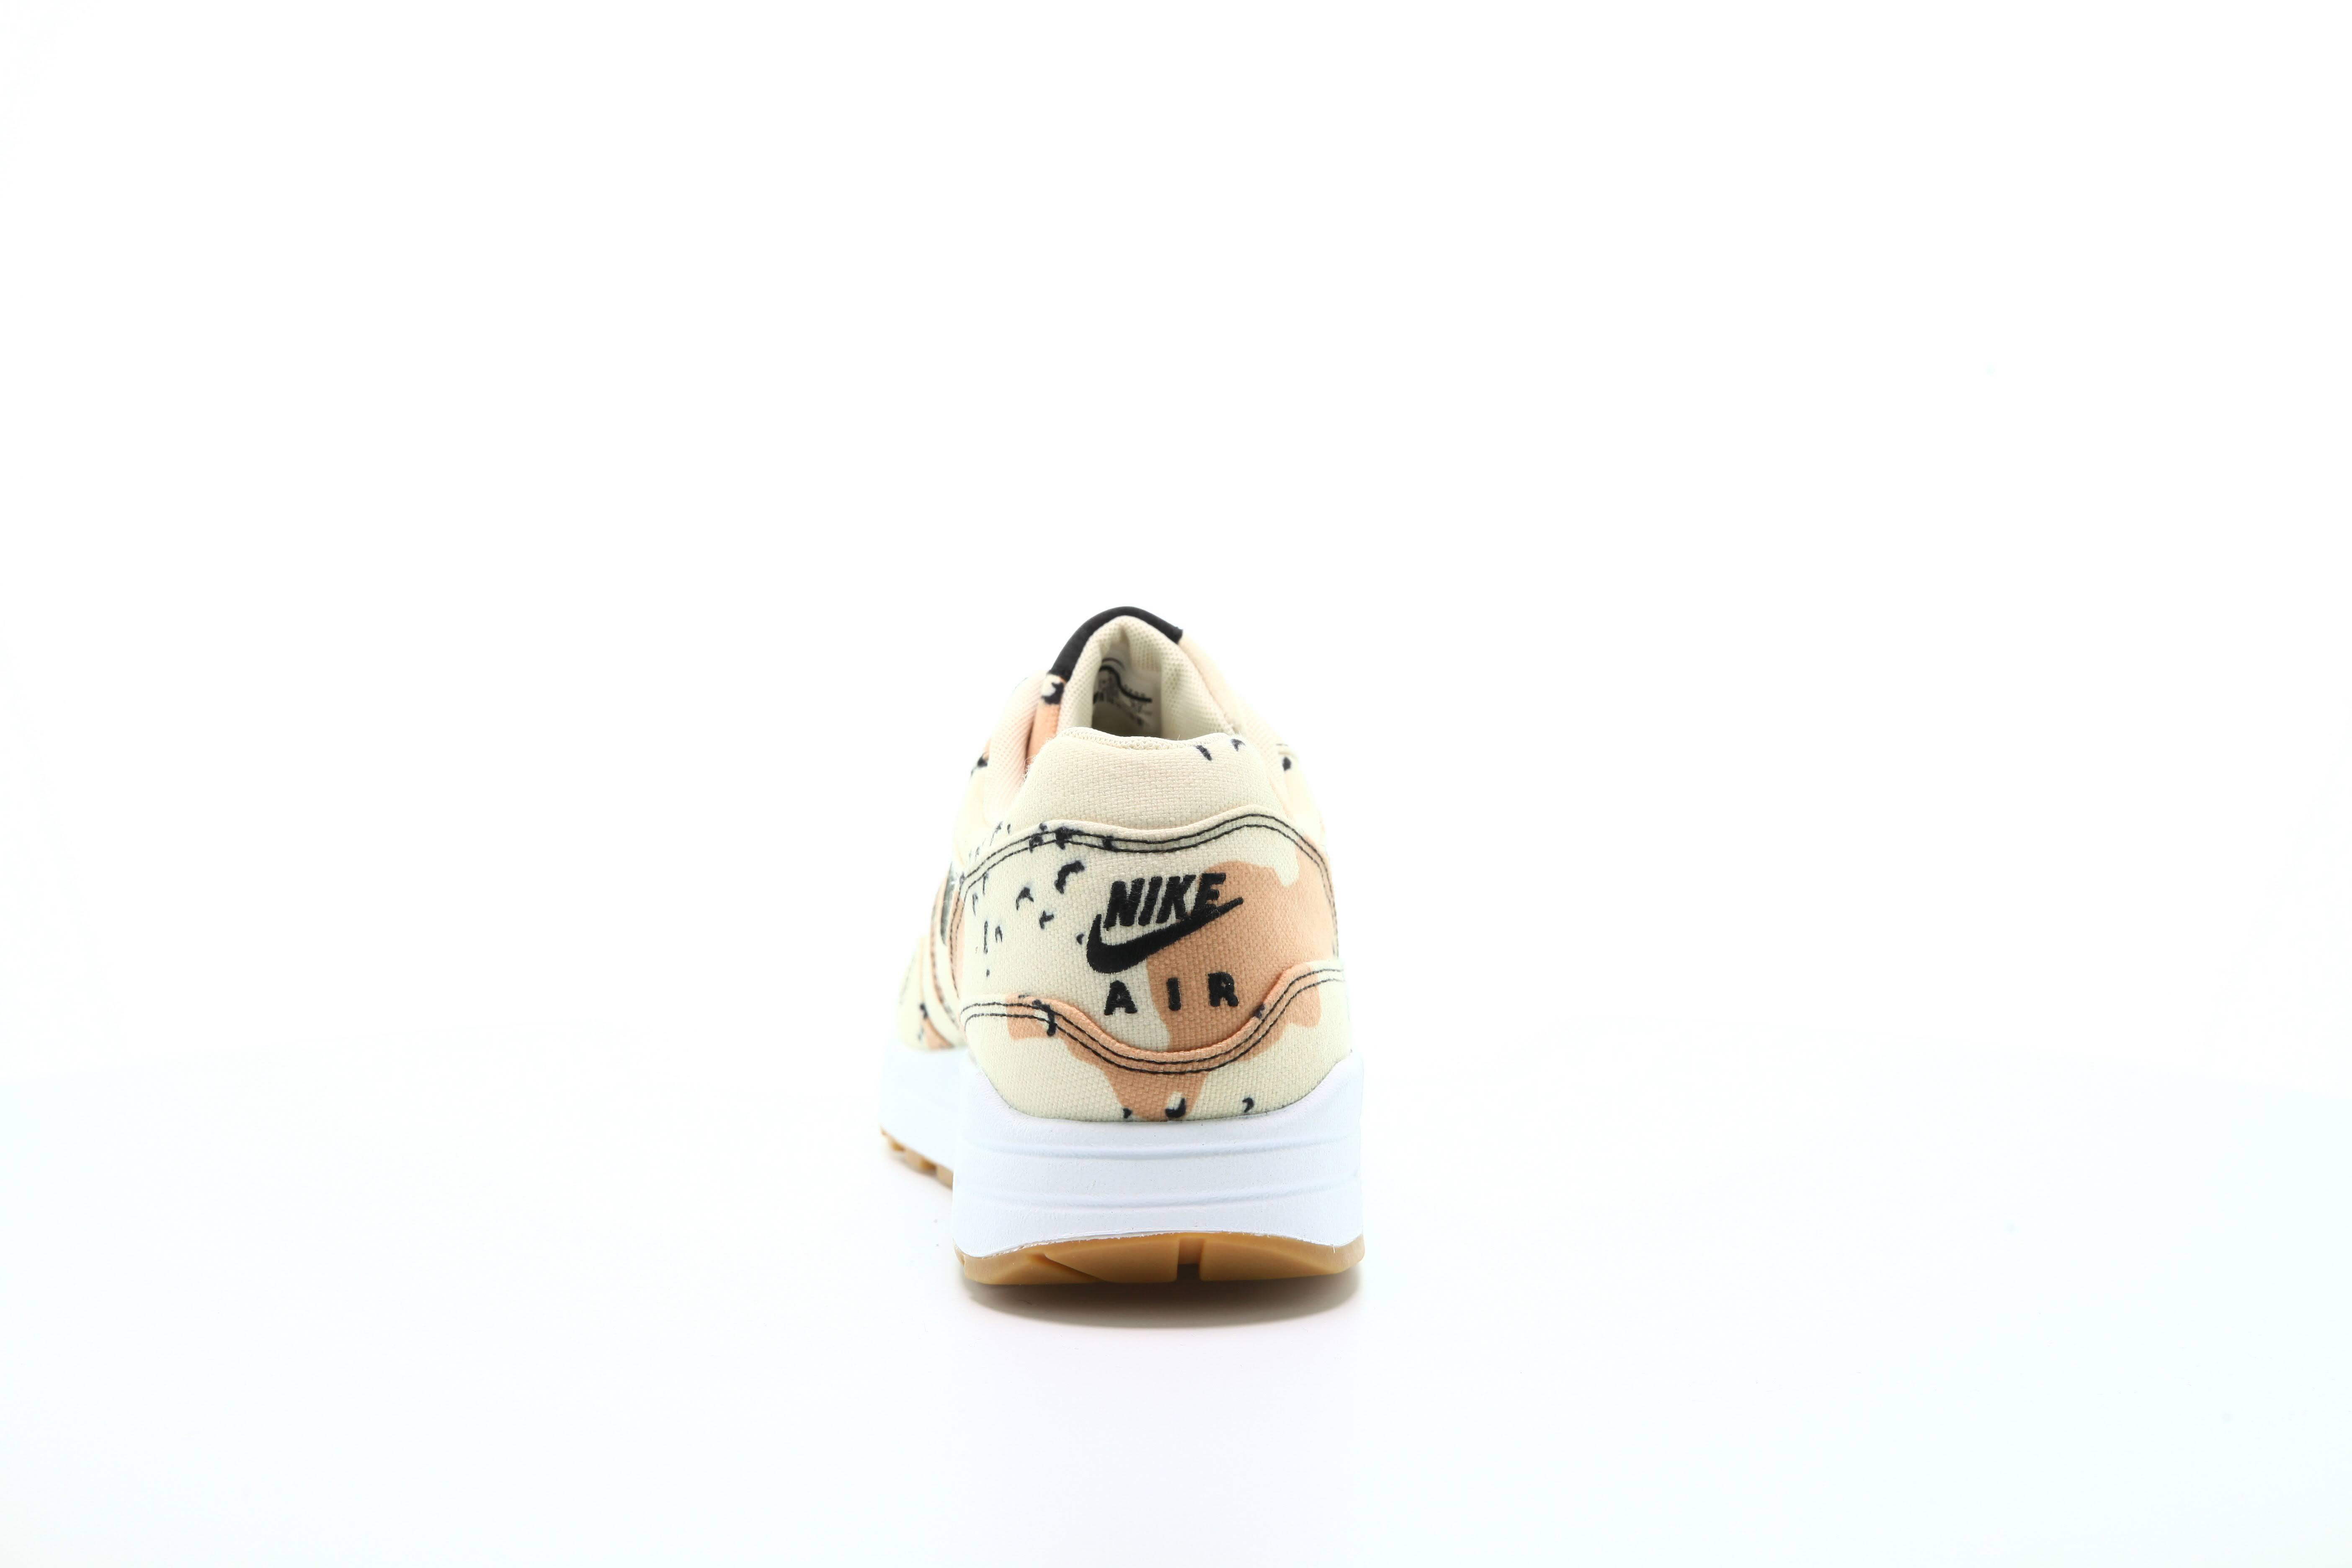 Męskie Beżowe 1 7 Air Max Czarne Nike Premium Buty kremowe fSxqdUzUw